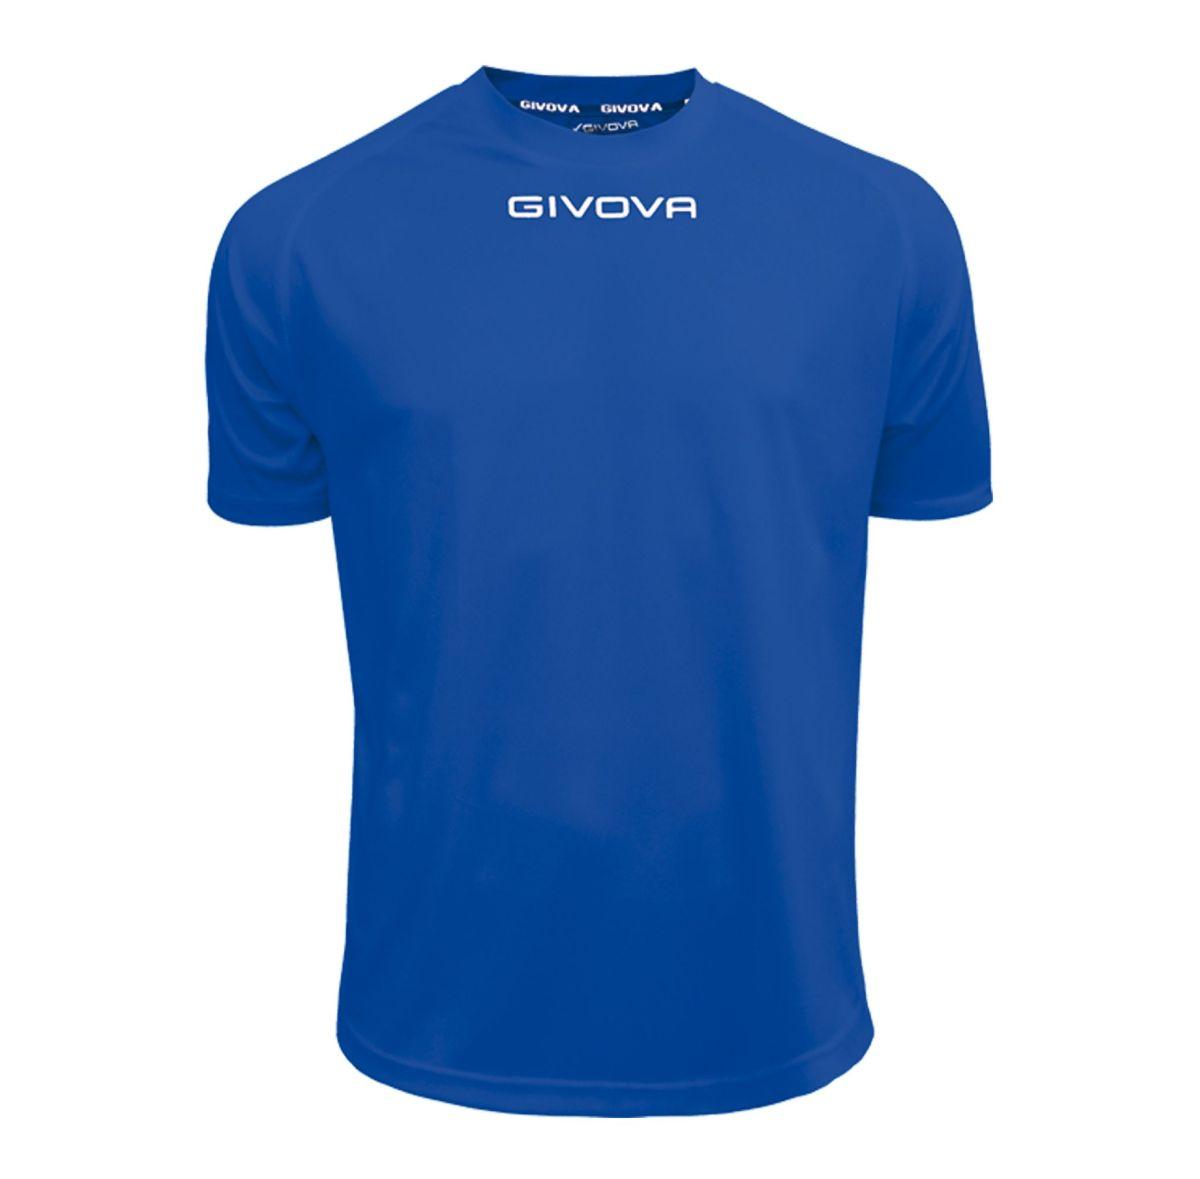 Givova Training T Shirt Royal Blue